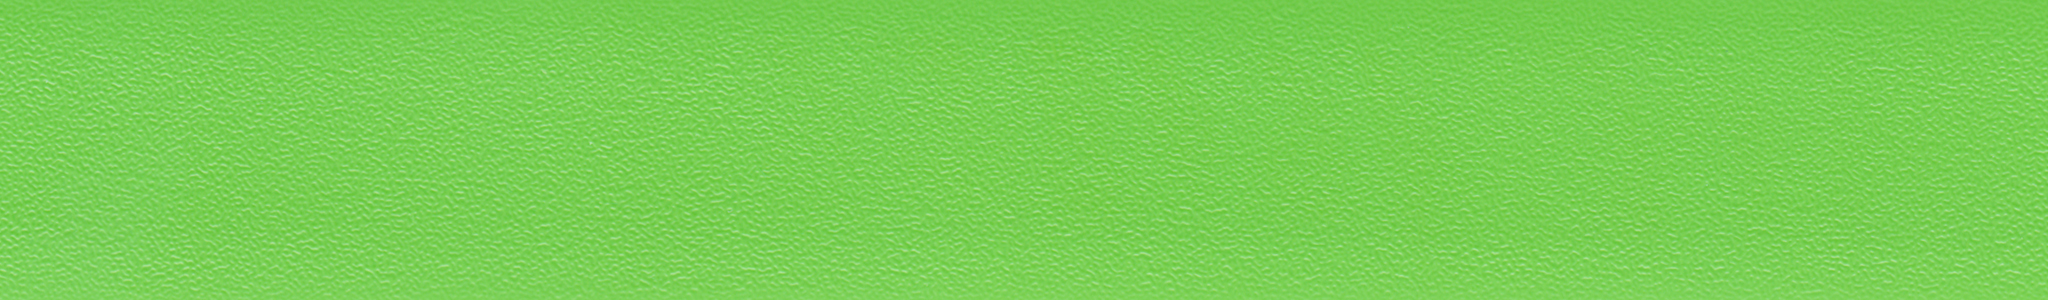 HU 162643 ABS hrana zelená perla 101